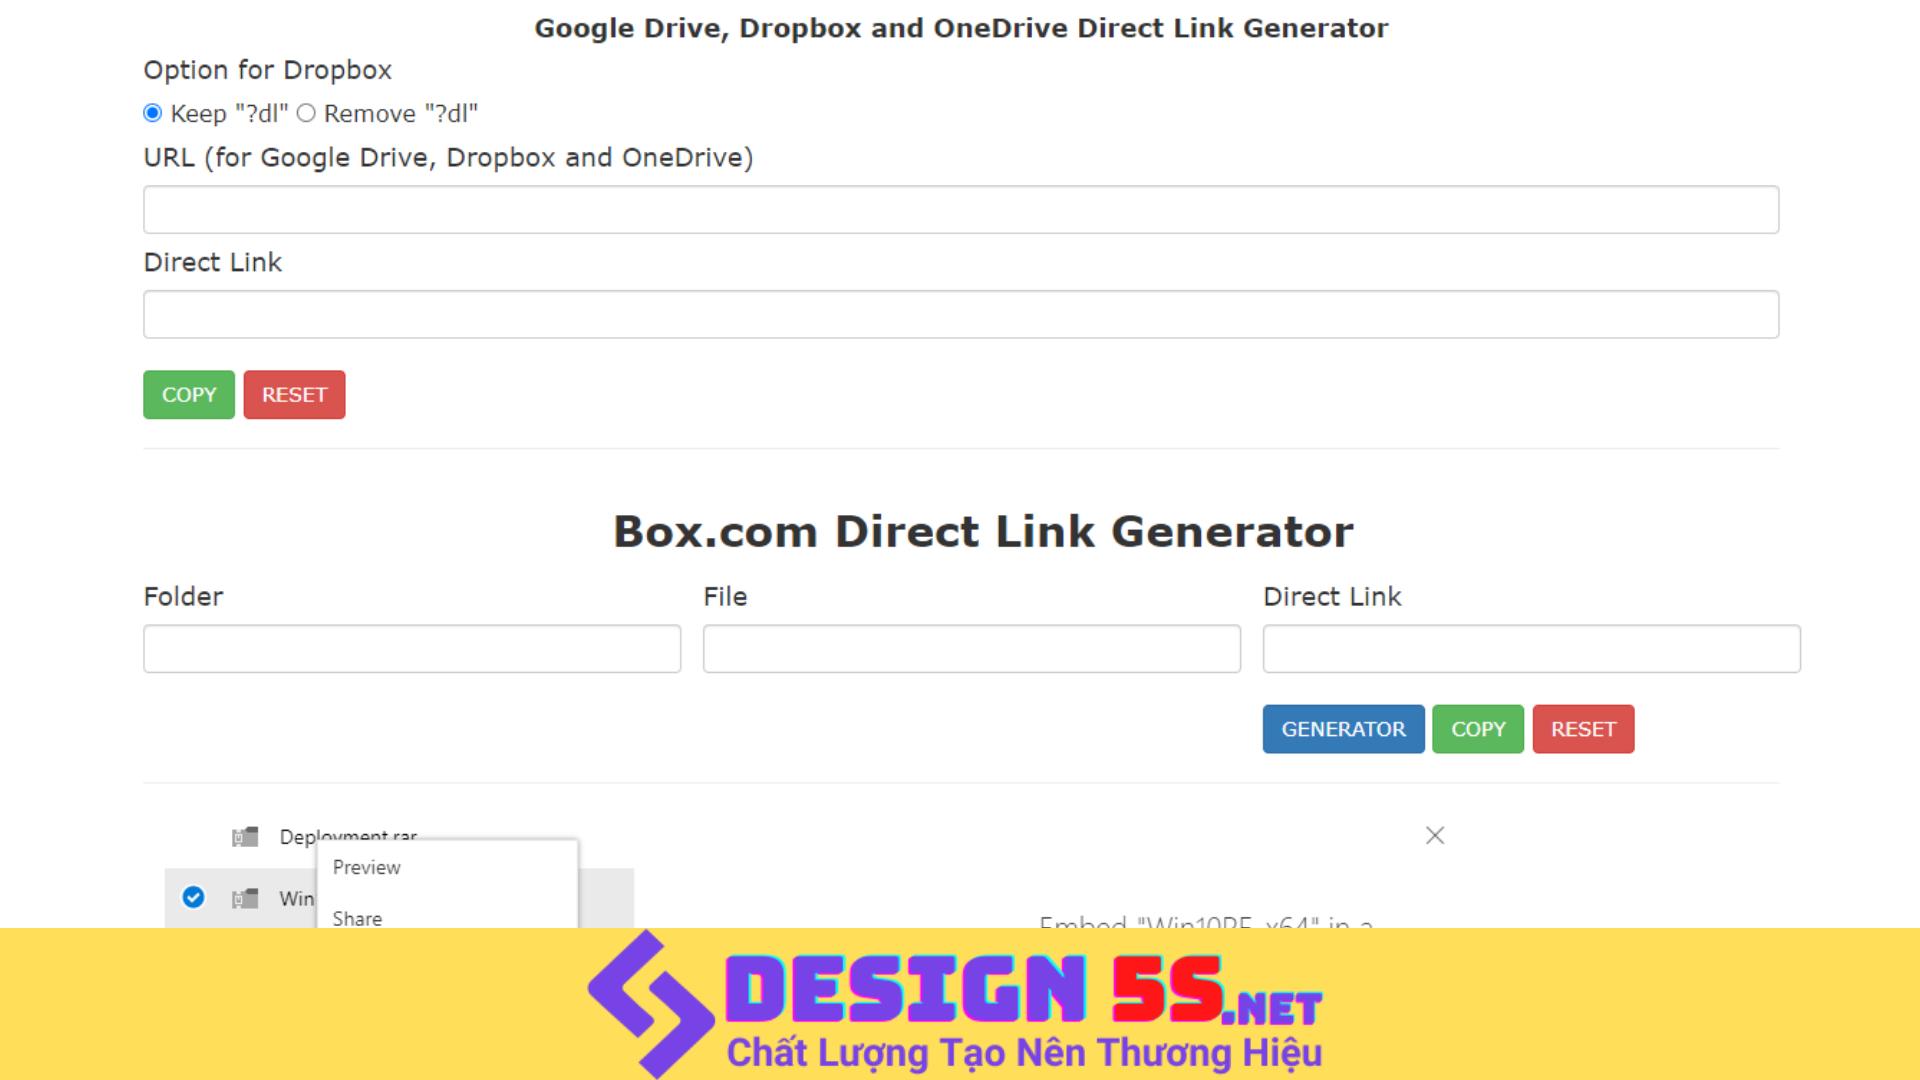 Generator Template blogspot (Google Drive, Dropbox,...) - Ảnh 2